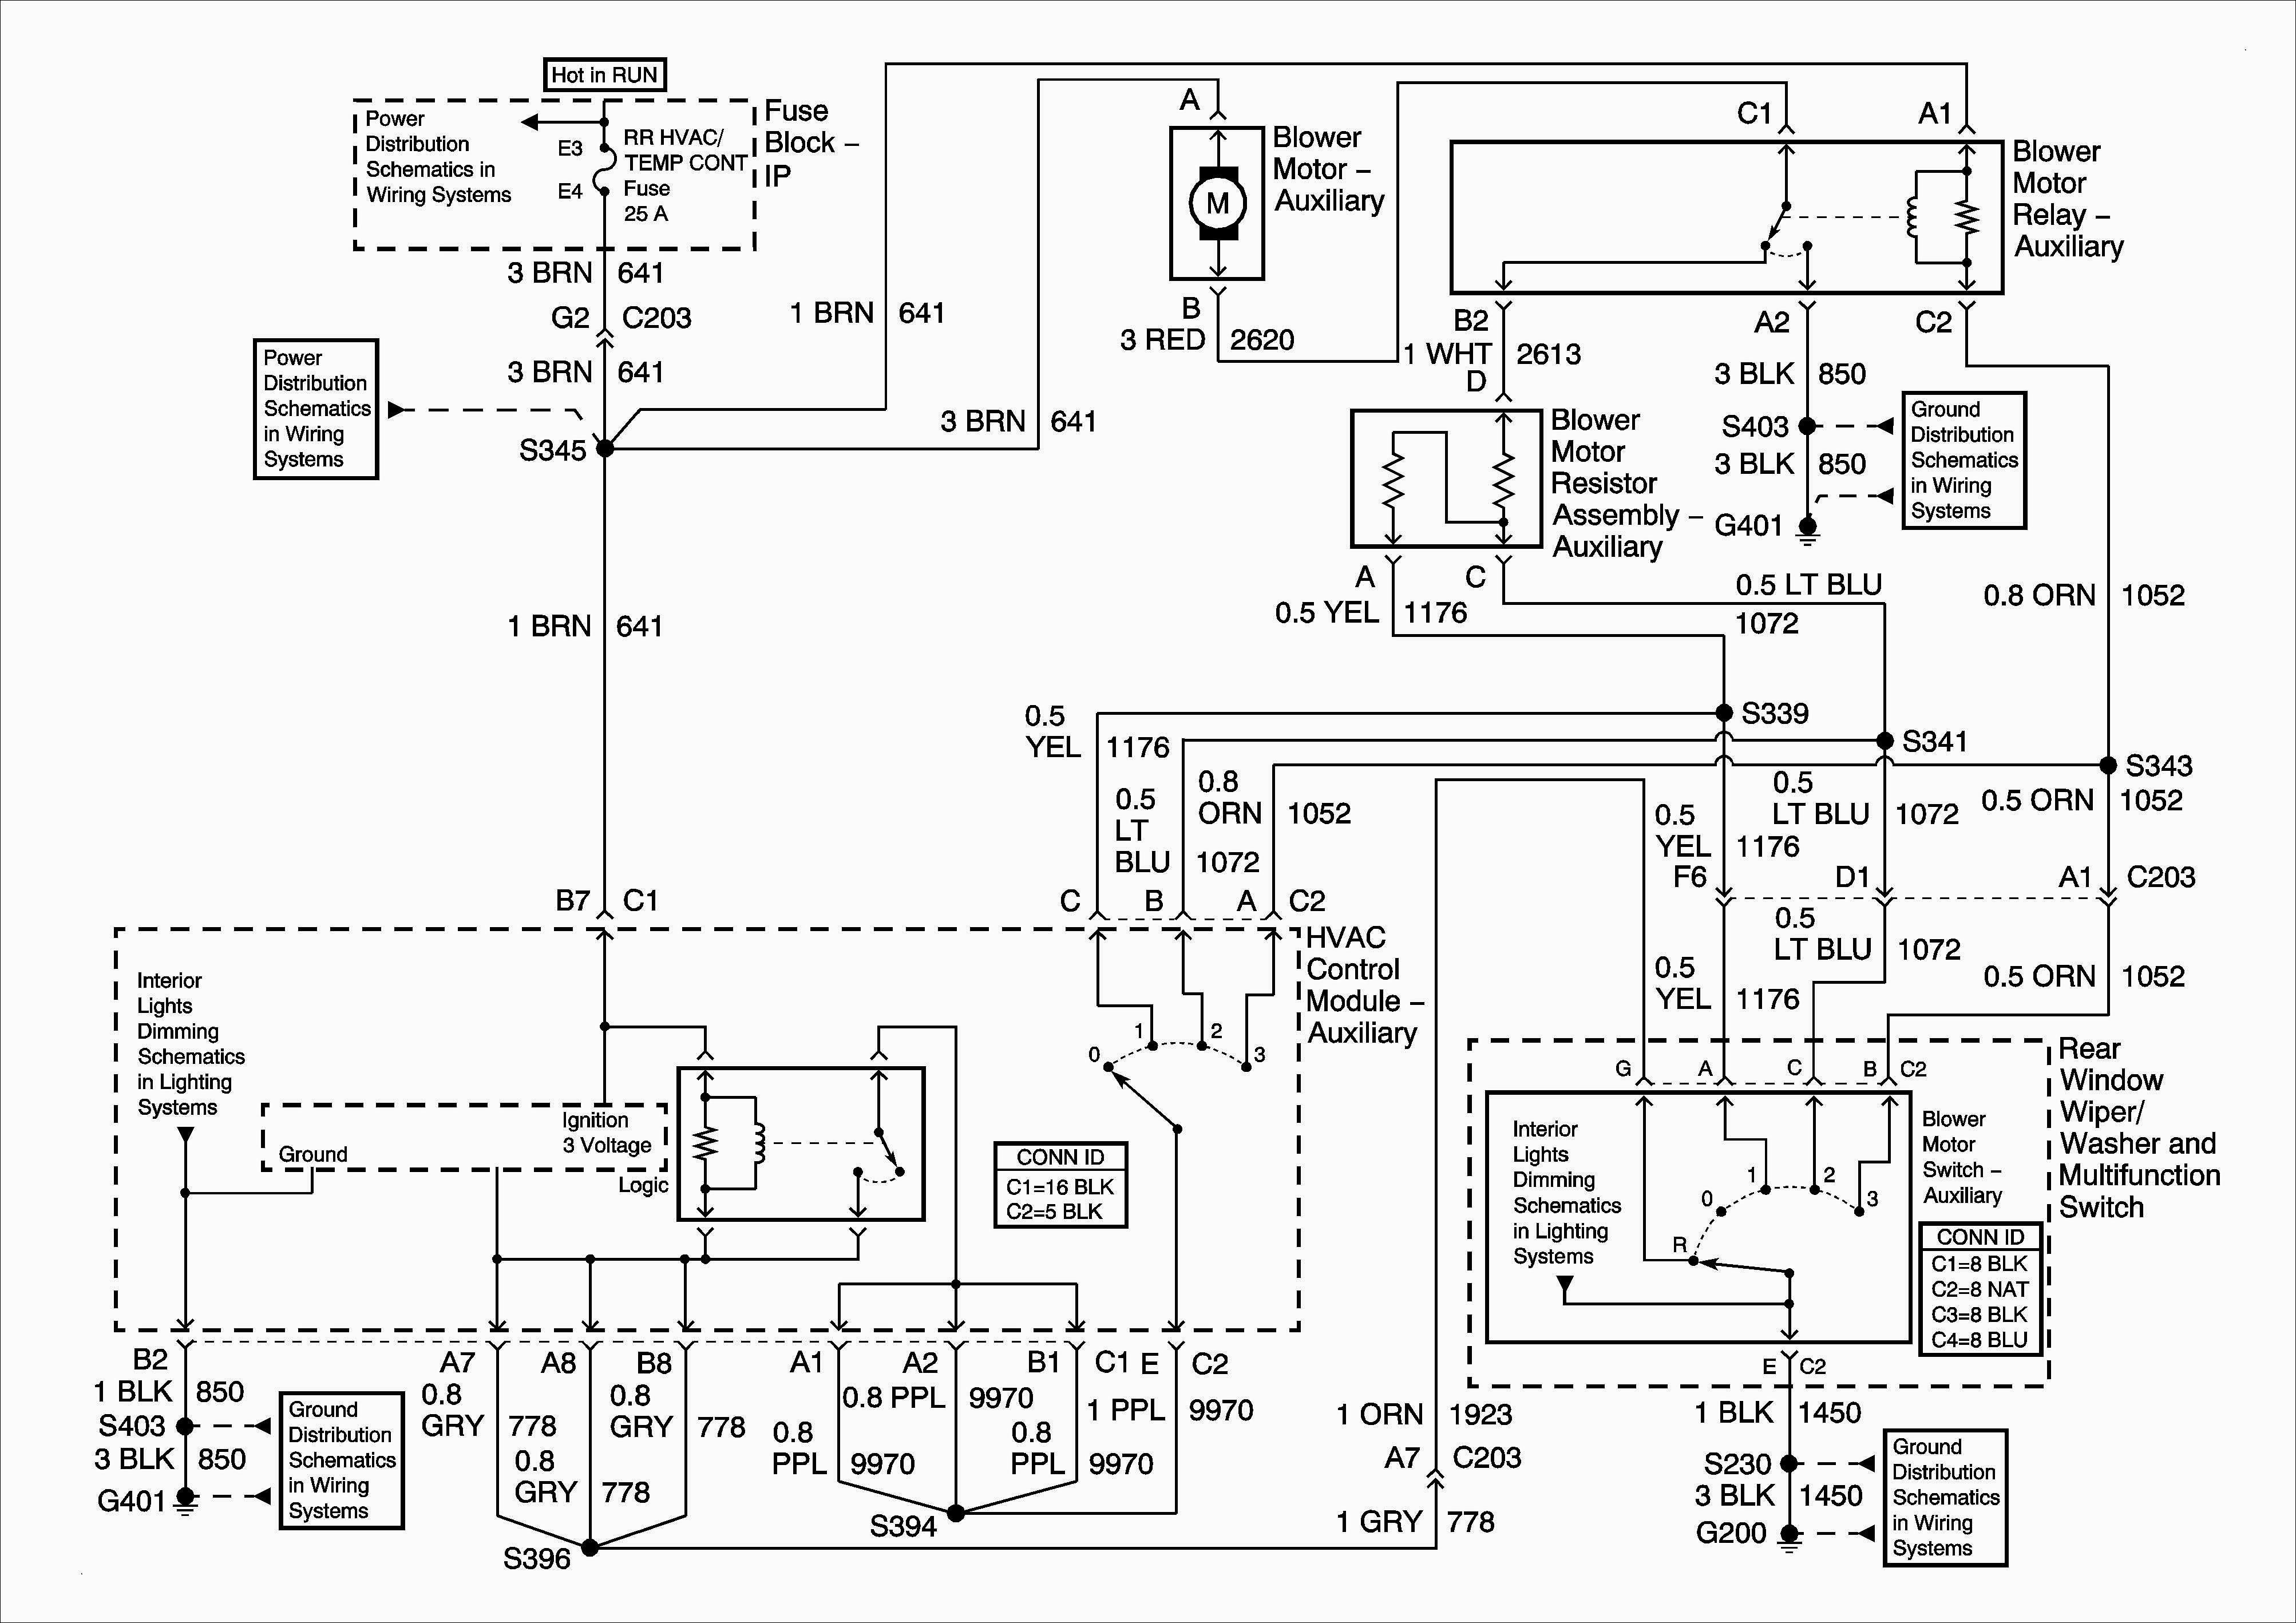 [DHAV_9290]  20 Automatic Auto Wiring Diagram Software Ideas ,  https://bacamajalah.com/20-automatic-auto-wiring… | Electrical wiring  diagram, Diagram, Electrical circuit diagram | Car Audio Wiring Diagram Software |  | Pinterest